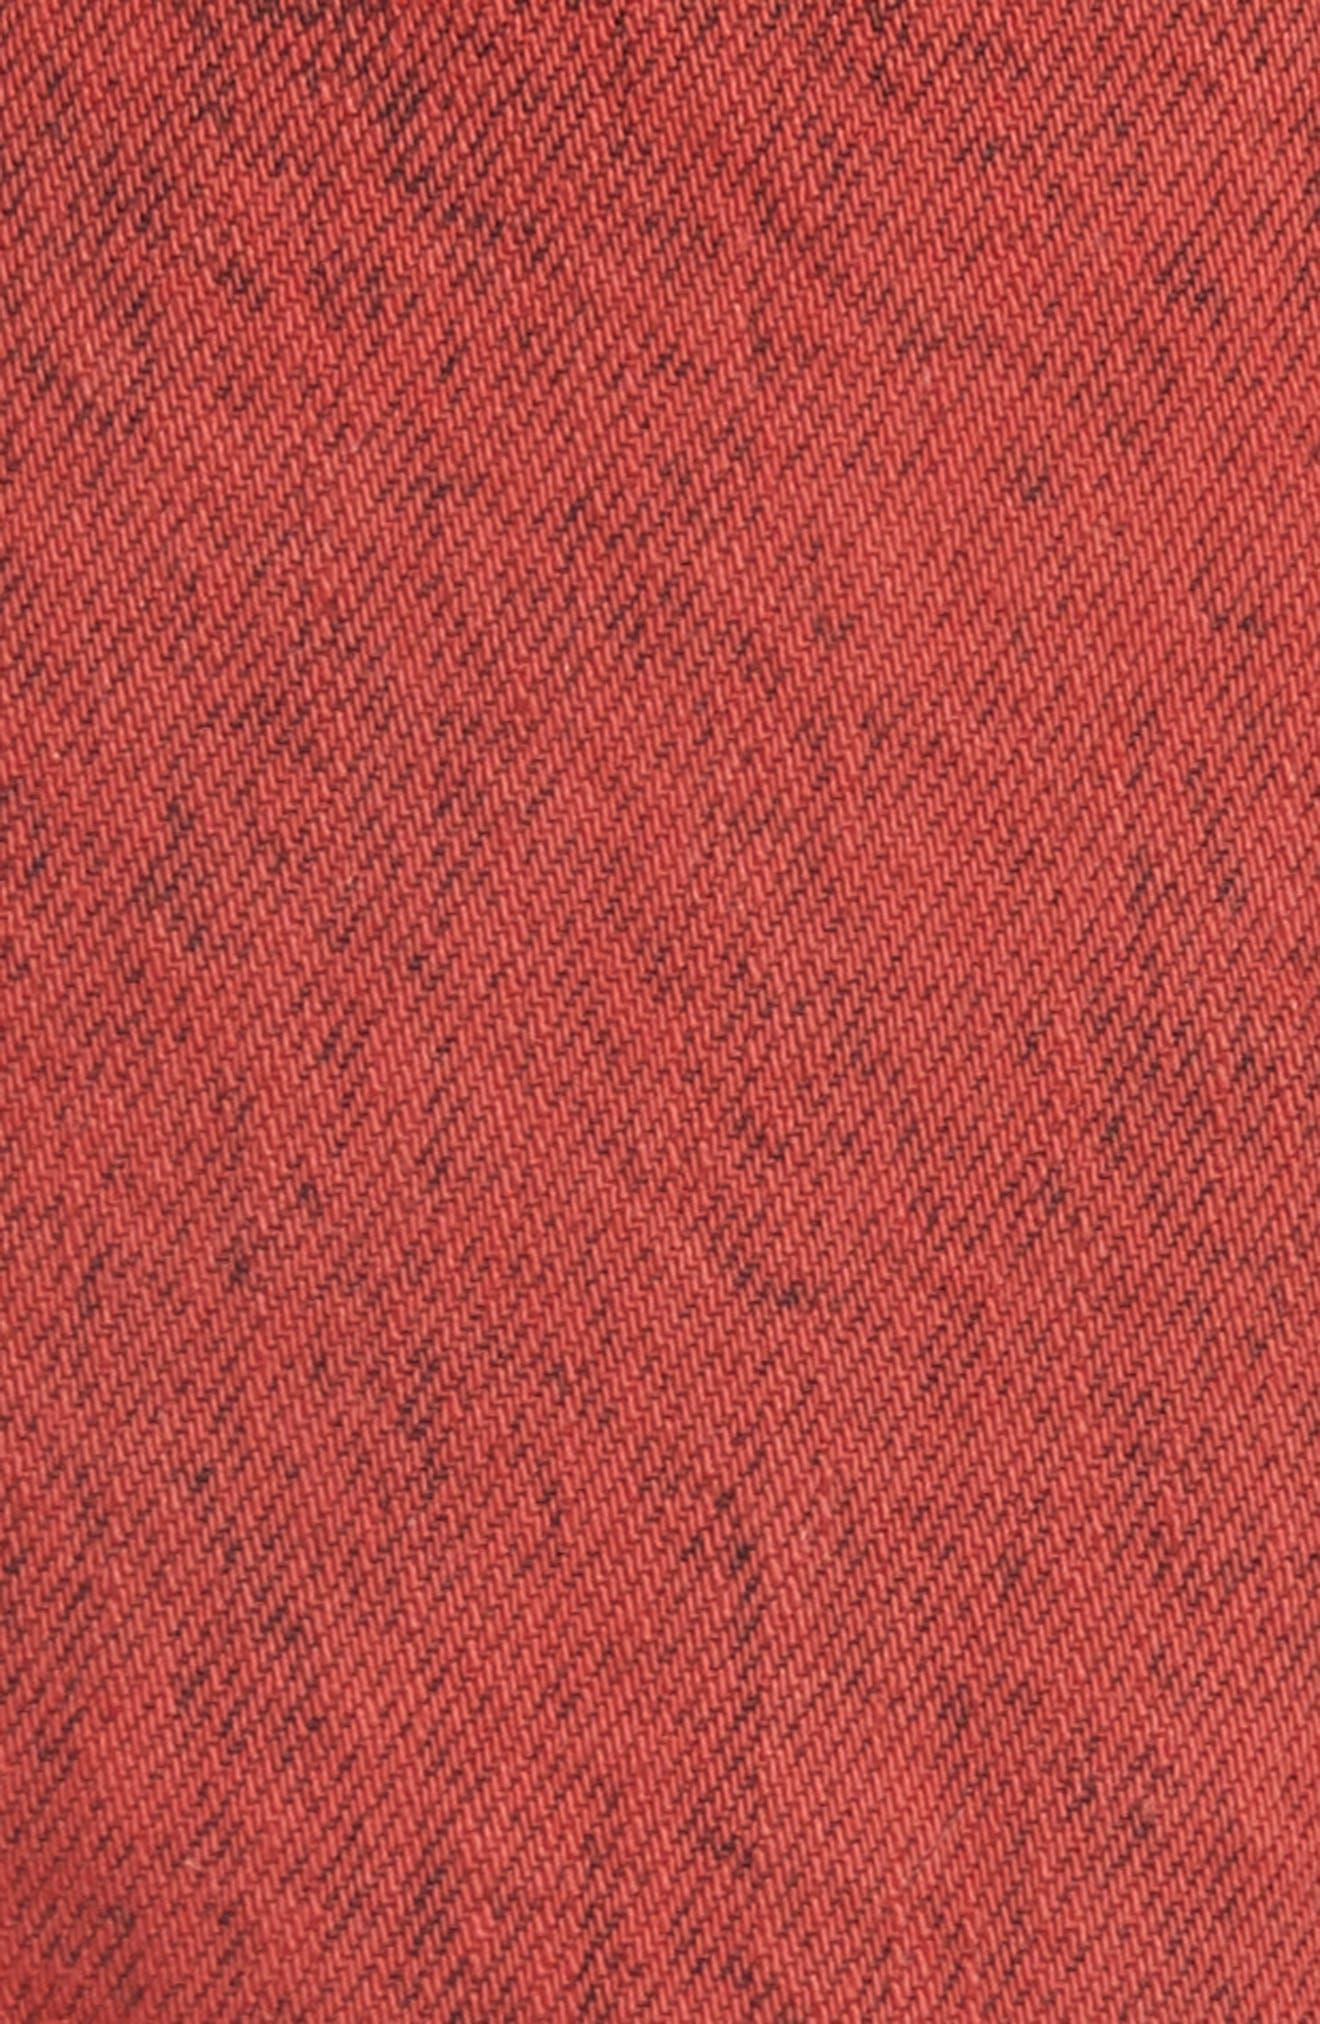 Sun Break Embellished Cutoff Shorts,                             Alternate thumbnail 5, color,                             Red